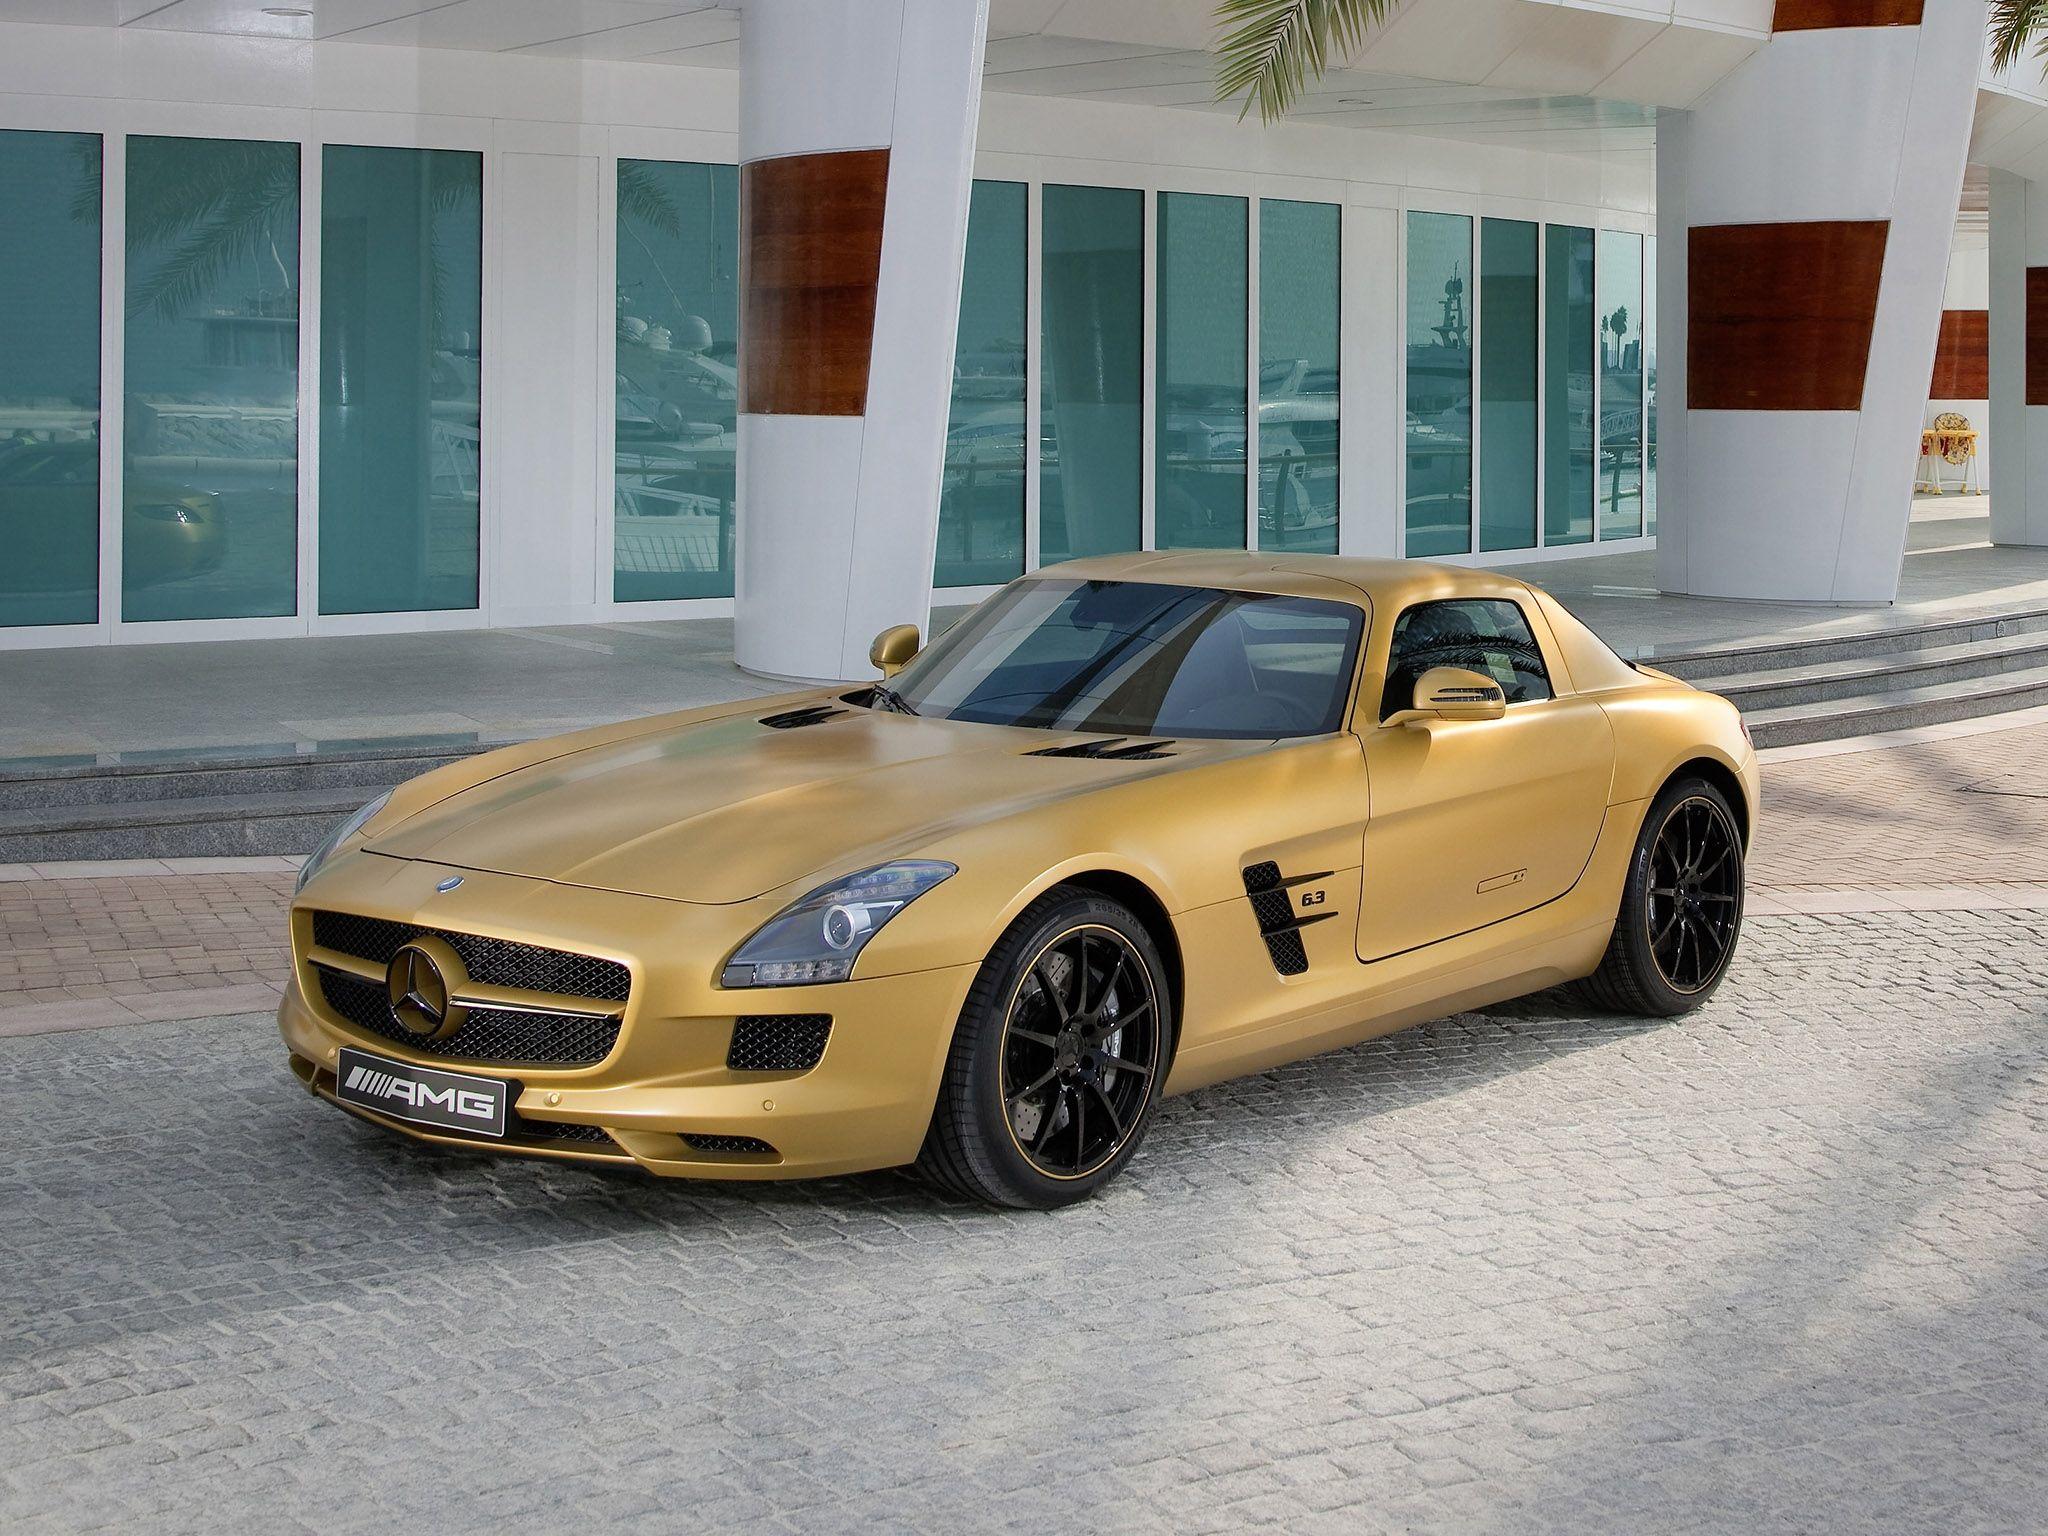 Mercedes Benz Sls 63 Amg Desert Gold Mercedes Benz Sls Amg